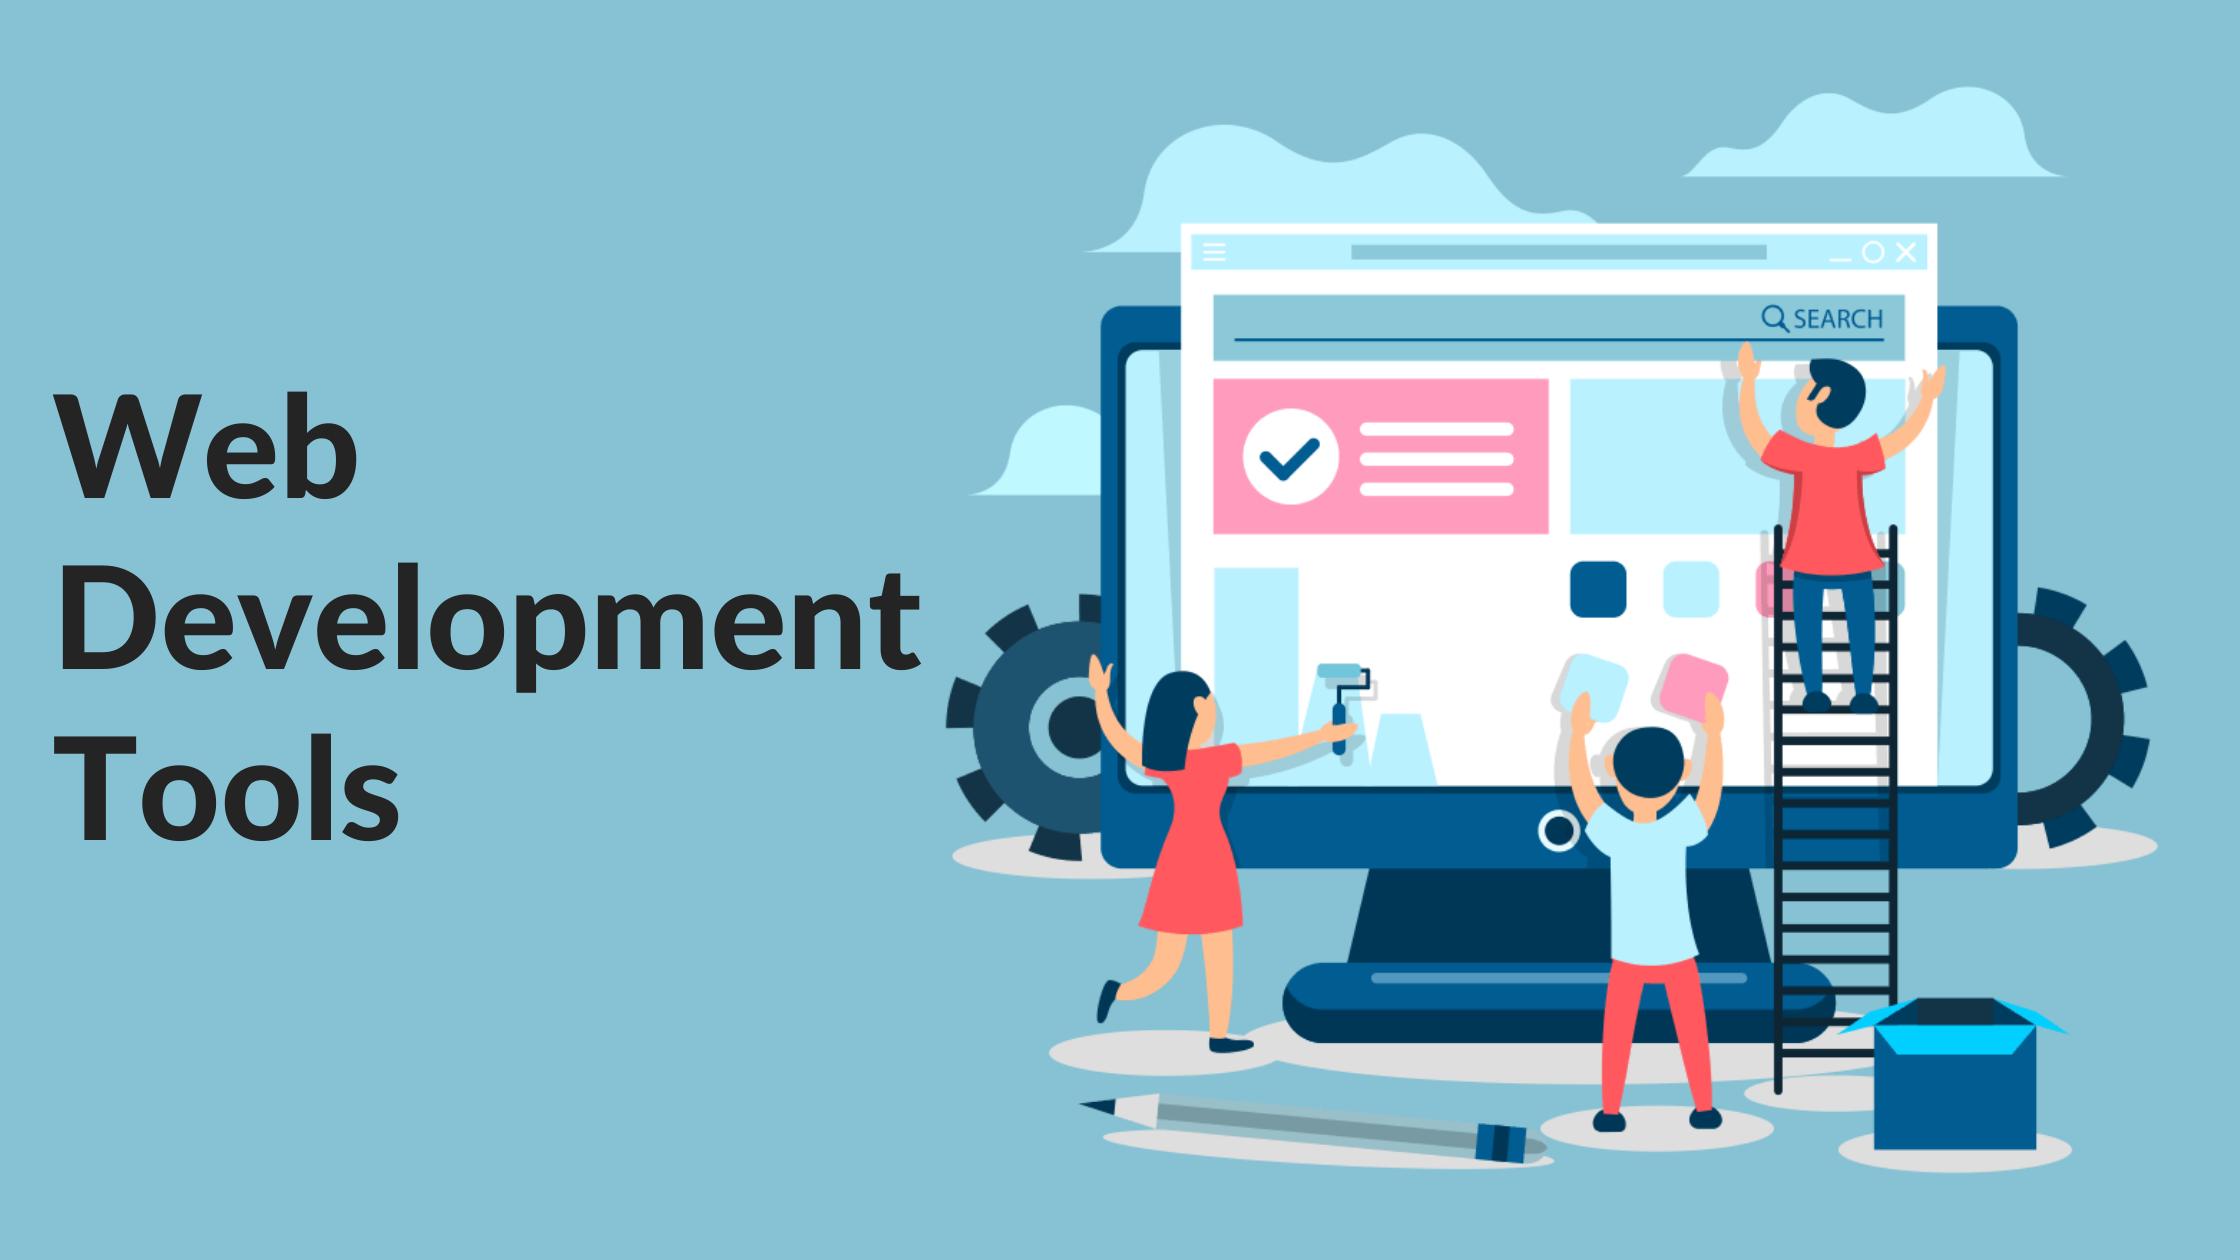 Web Application Development Tools